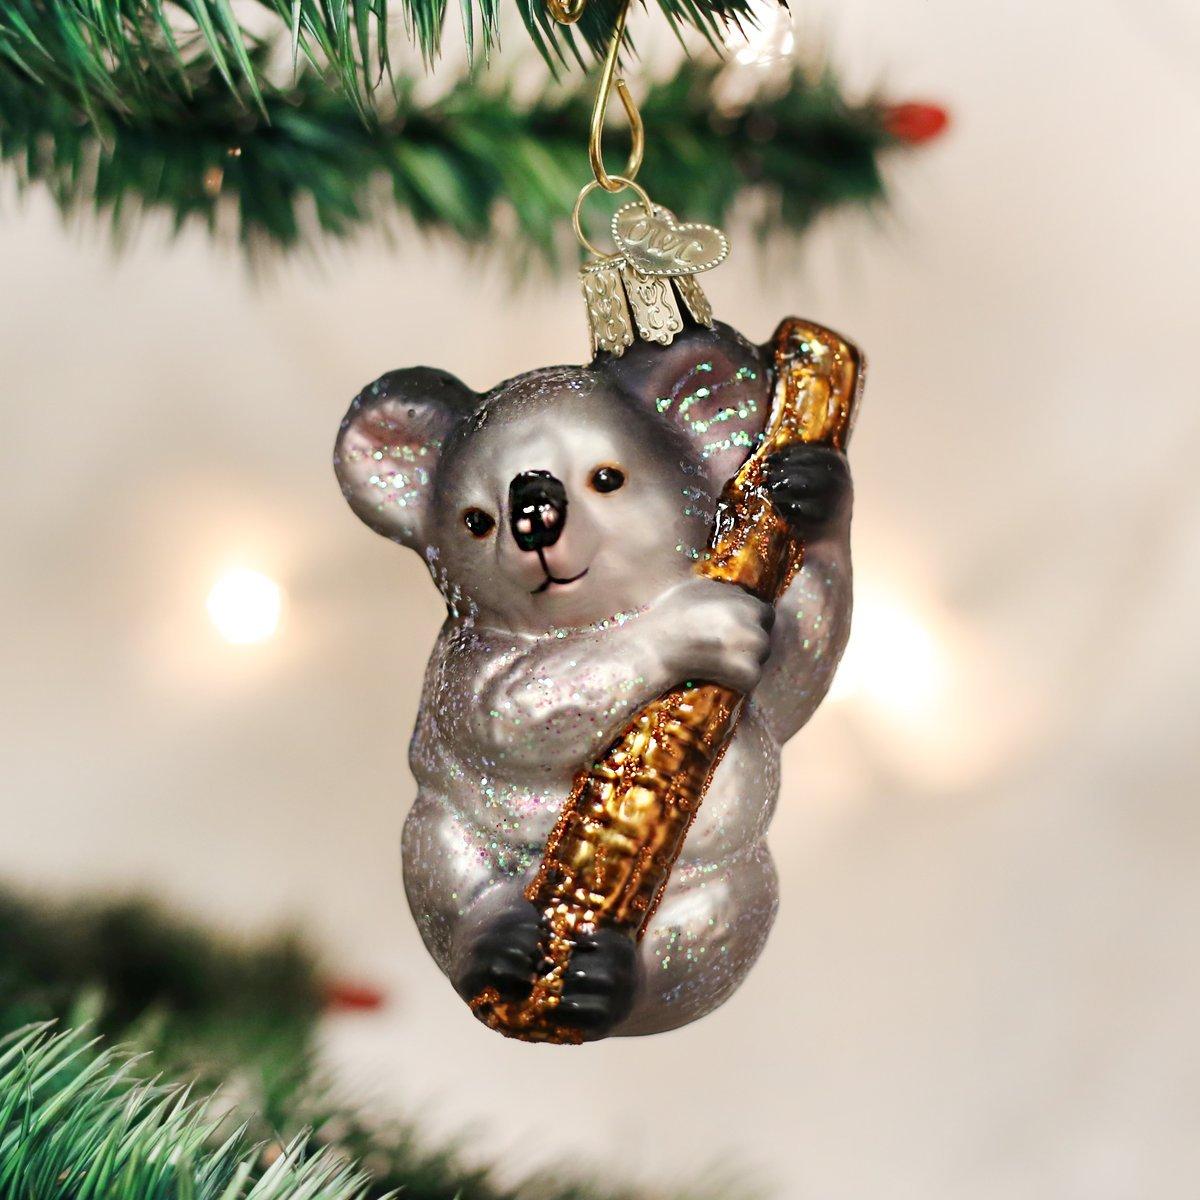 Old World Christmas Ornaments: Koala Bear Glass Blown Ornaments for Christmas Tree